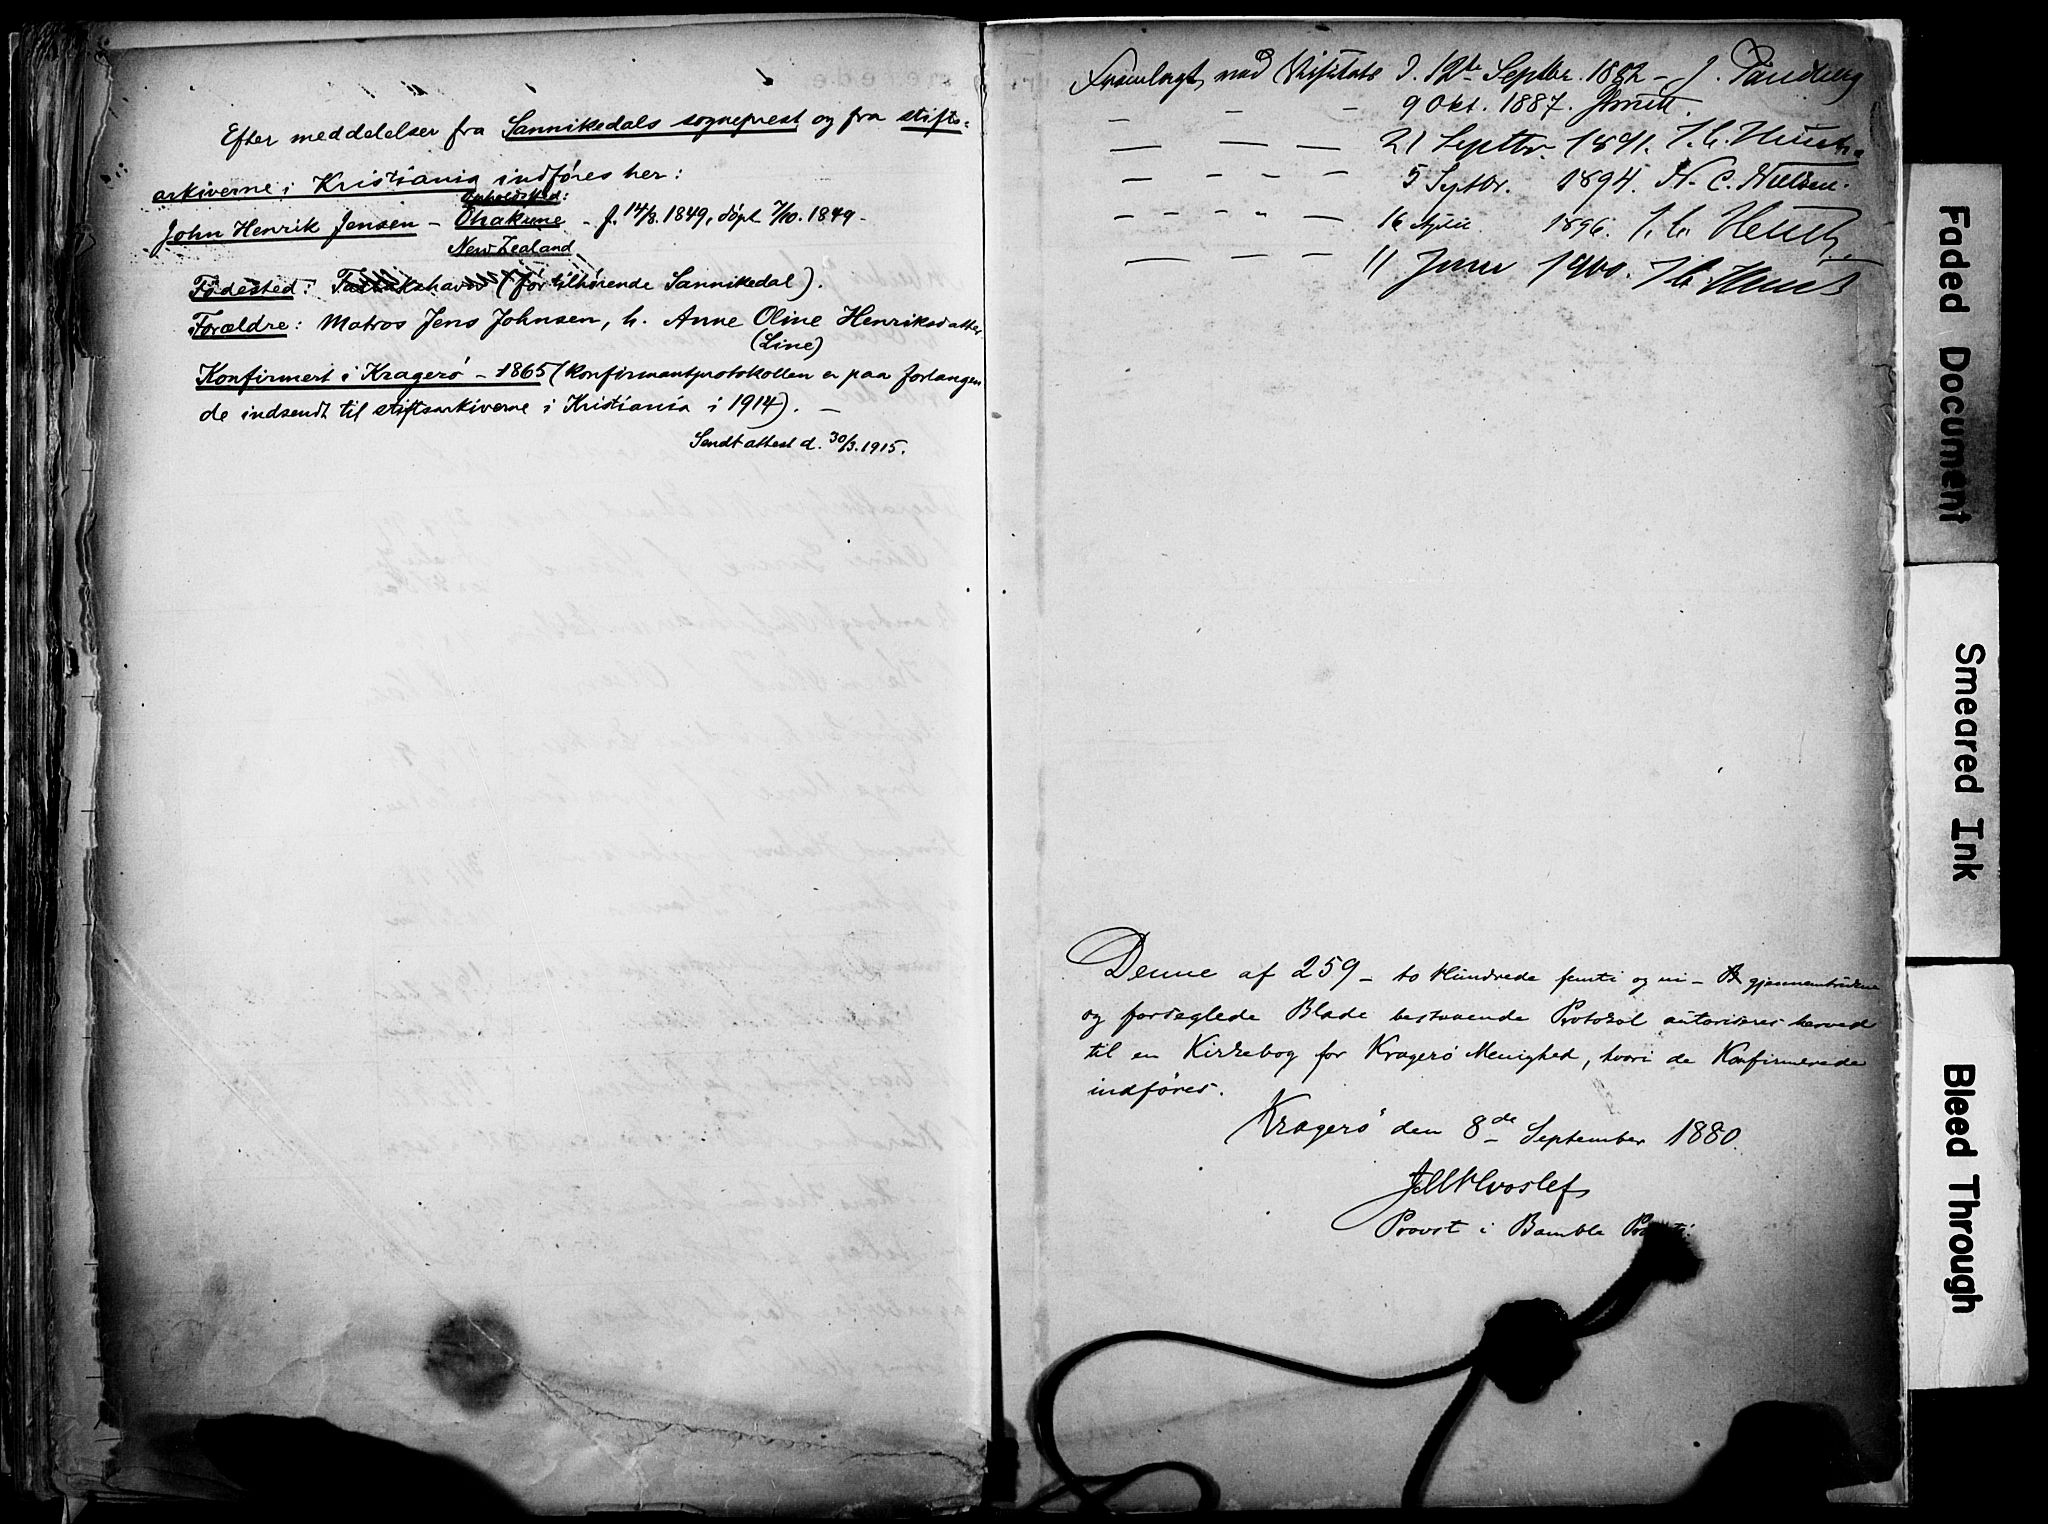 SAKO, Kragerø kirkebøker, F/Fa/L0012: Ministerialbok nr. I 12, 1880-1904